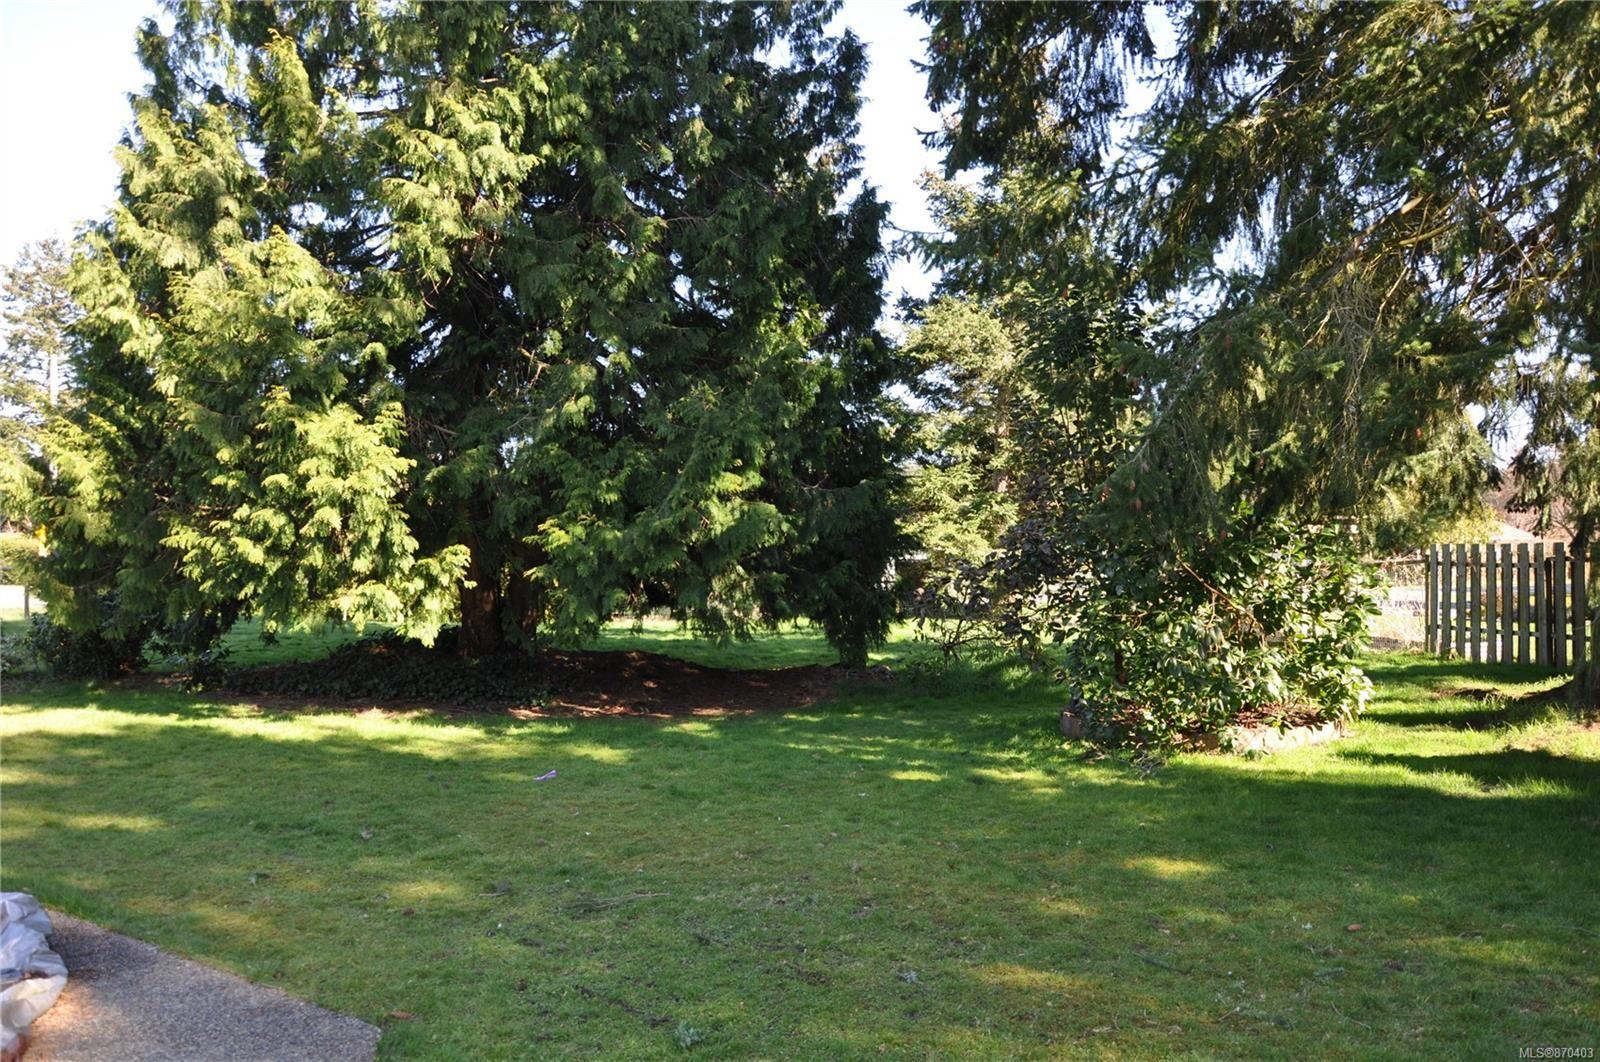 Main Photo: Lot 9 Ballenas Rd in : PQ Nanoose Land for sale (Parksville/Qualicum)  : MLS®# 870403